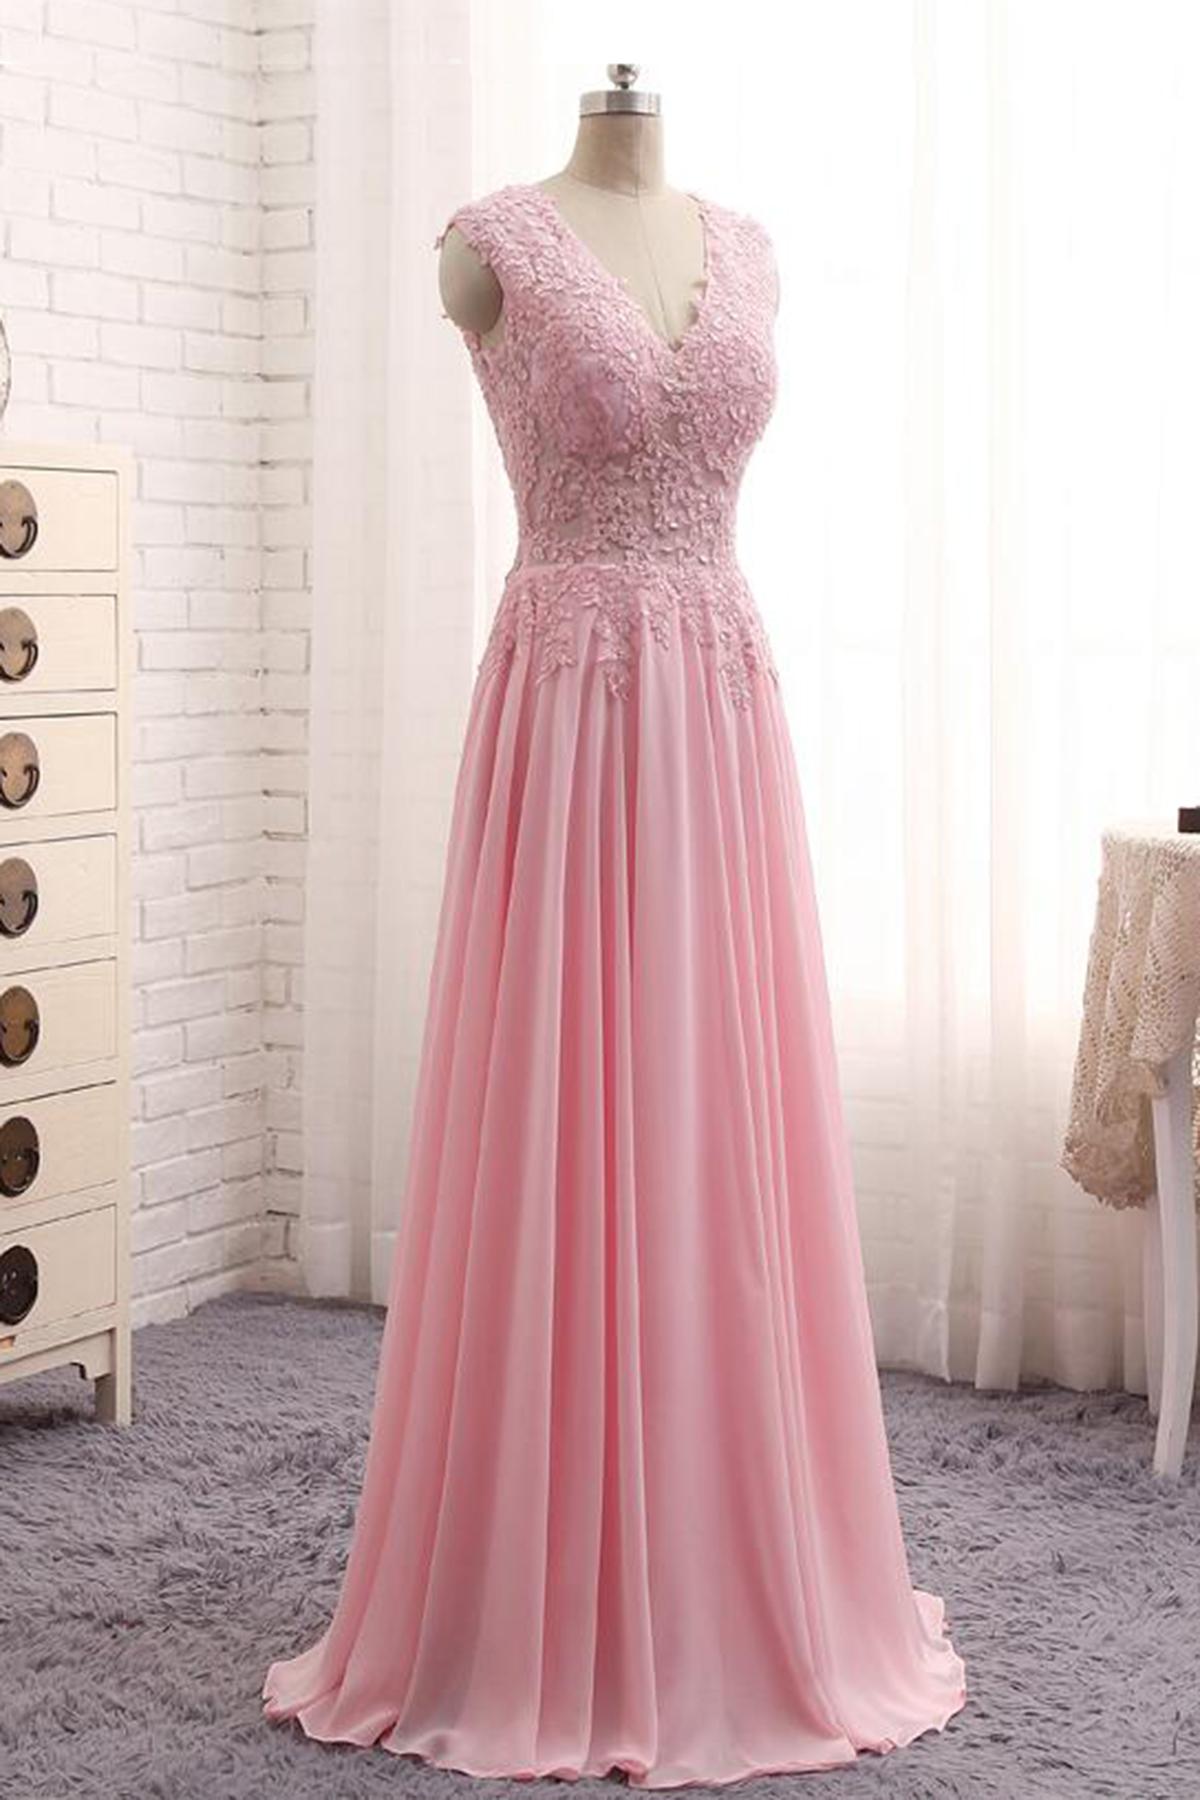 Cheap Prom Dresses by SweetheartDress  Elegant pink lace long Aline senior prom dress pink